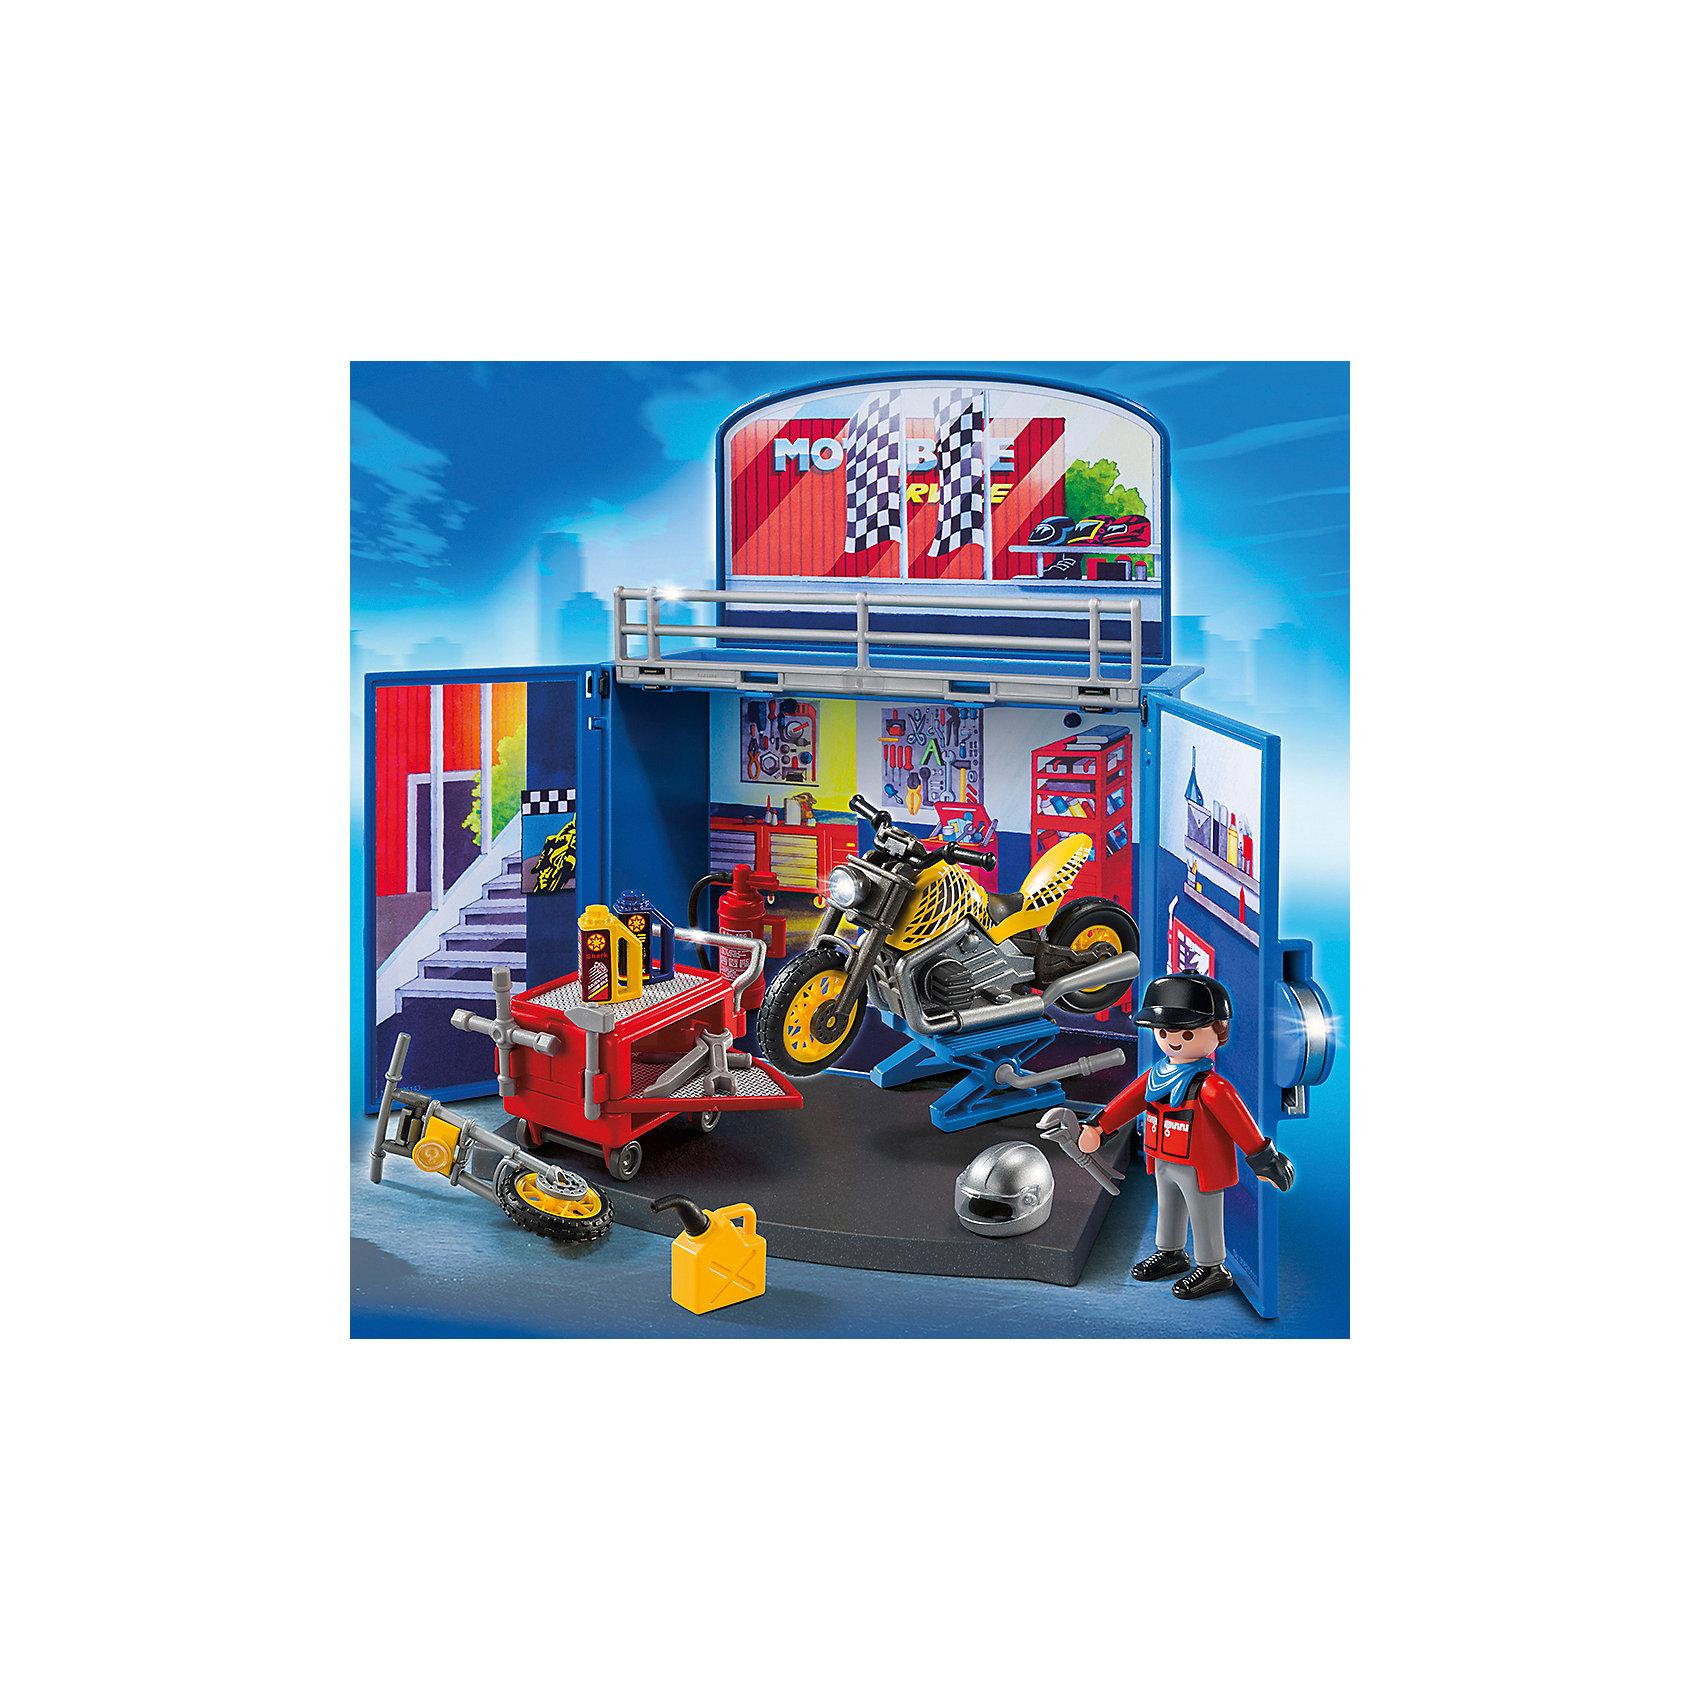 PLAYMOBIL® Возьми с собой: Мастерская мотоциклов, PLAYMOBIL playmobil® playmobil 5546 парк развлечений продавец шаров smileyworld